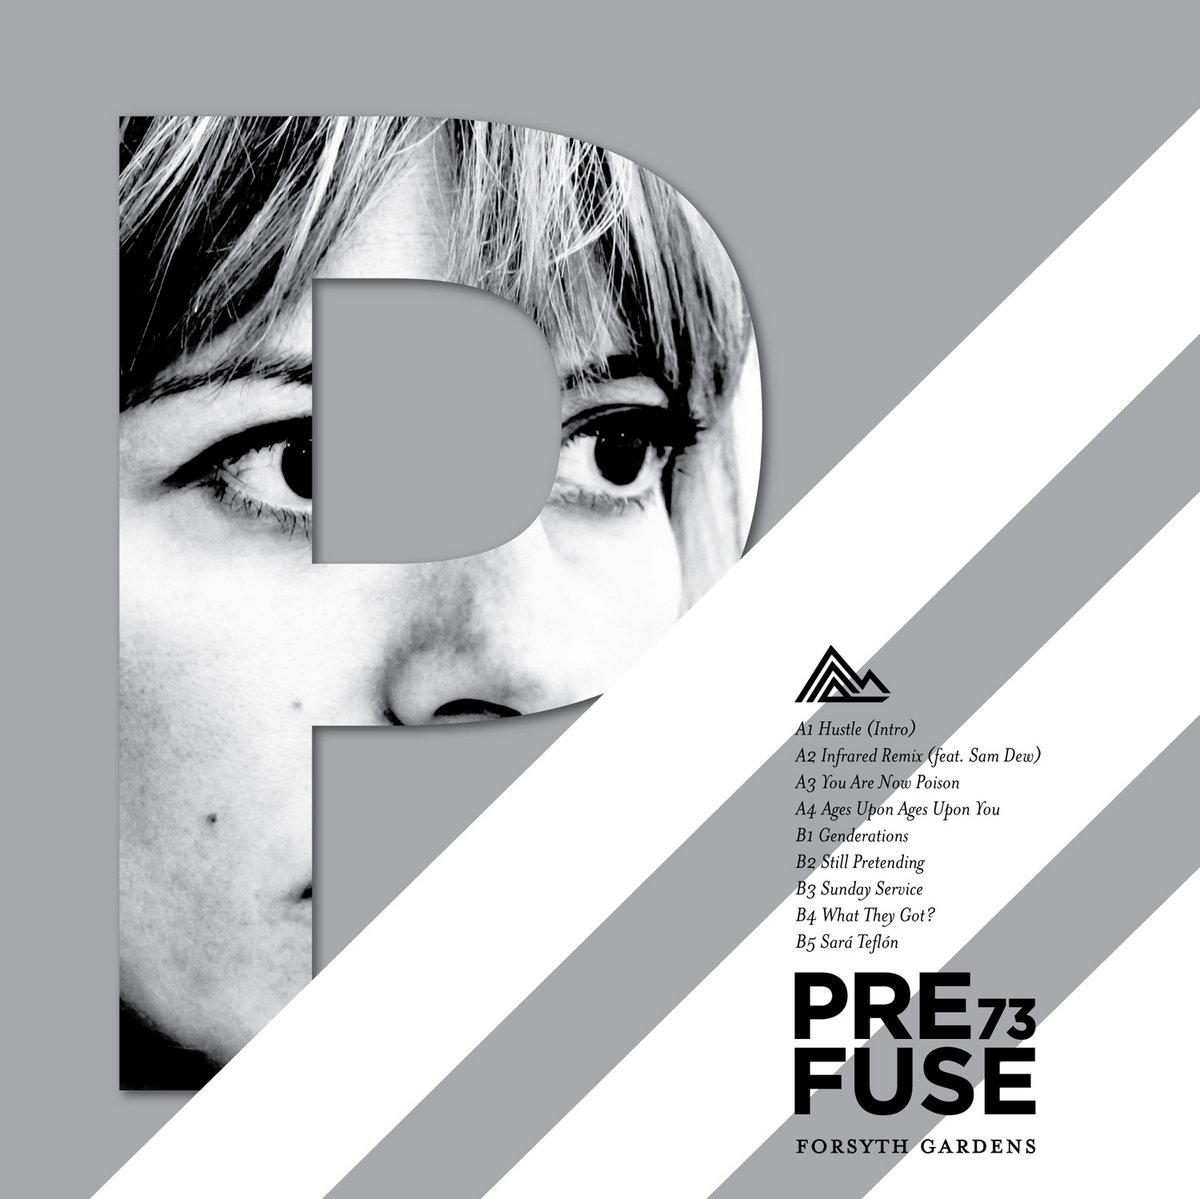 prefuse 73 discography